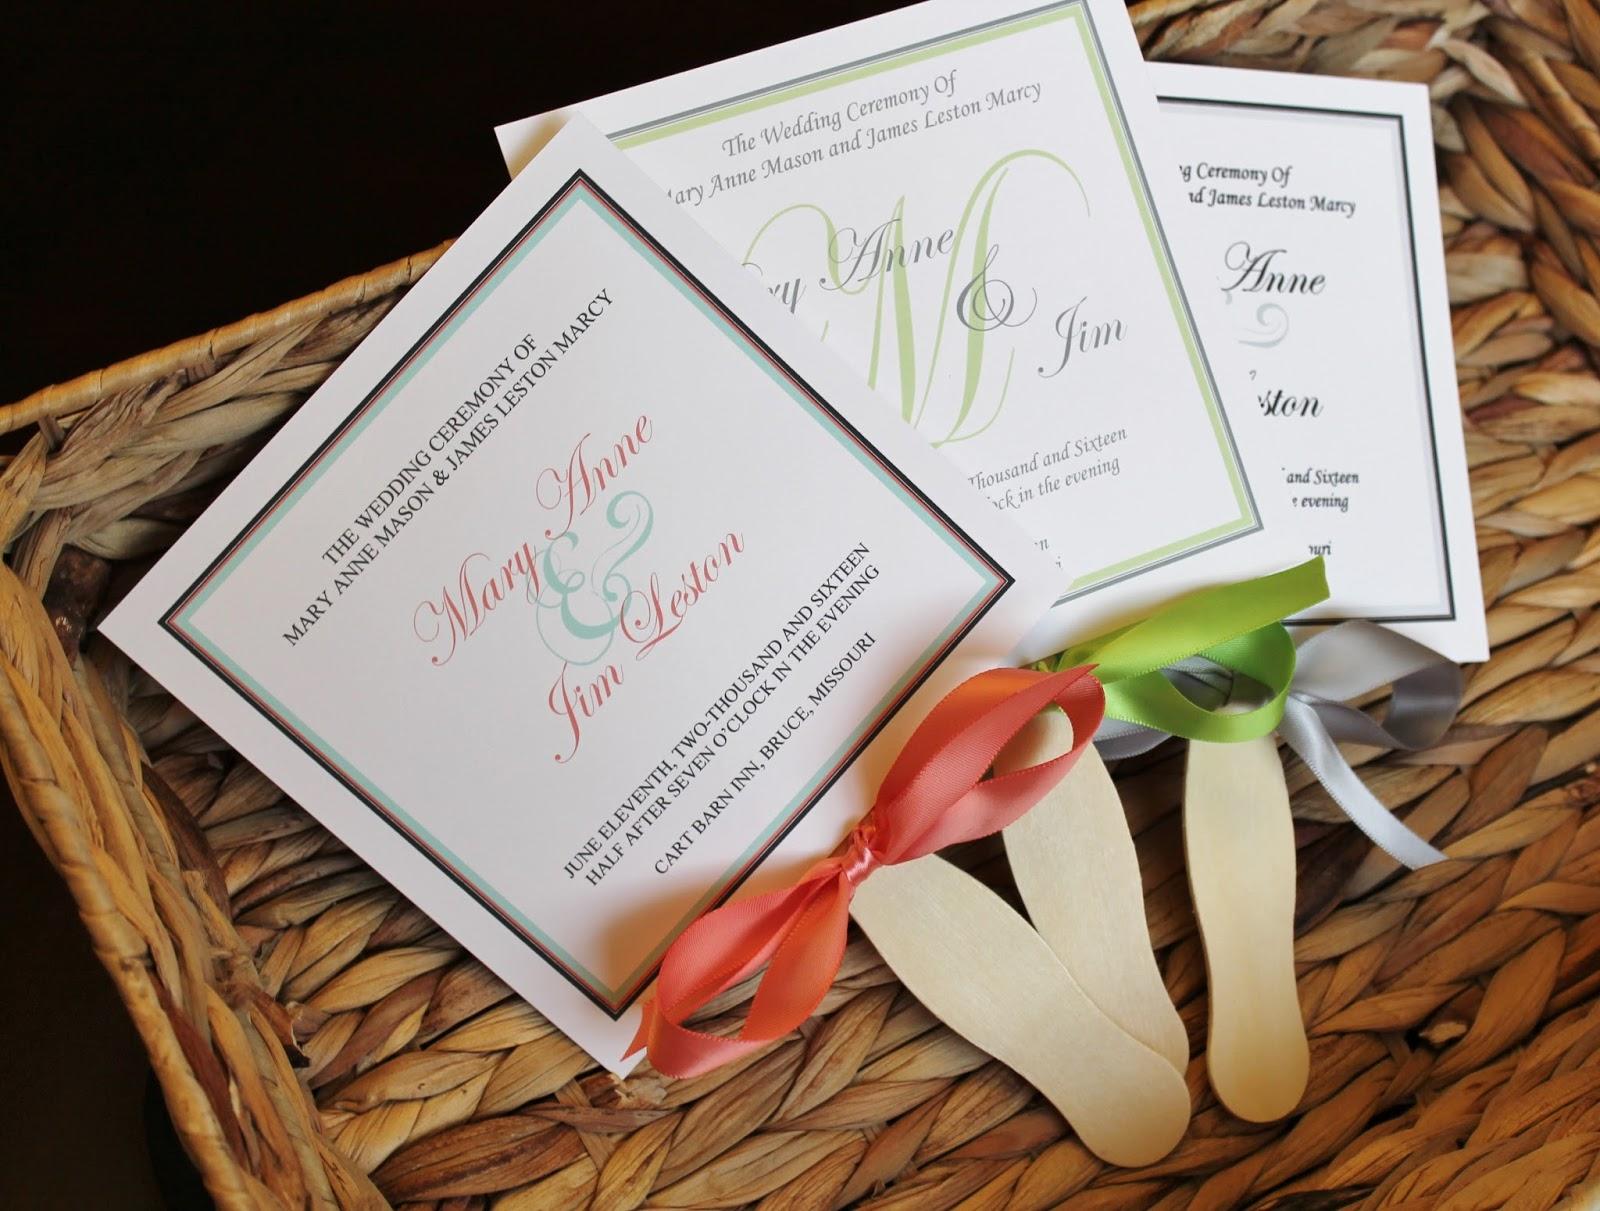 fan program for weddings - Dorit.mercatodos.co